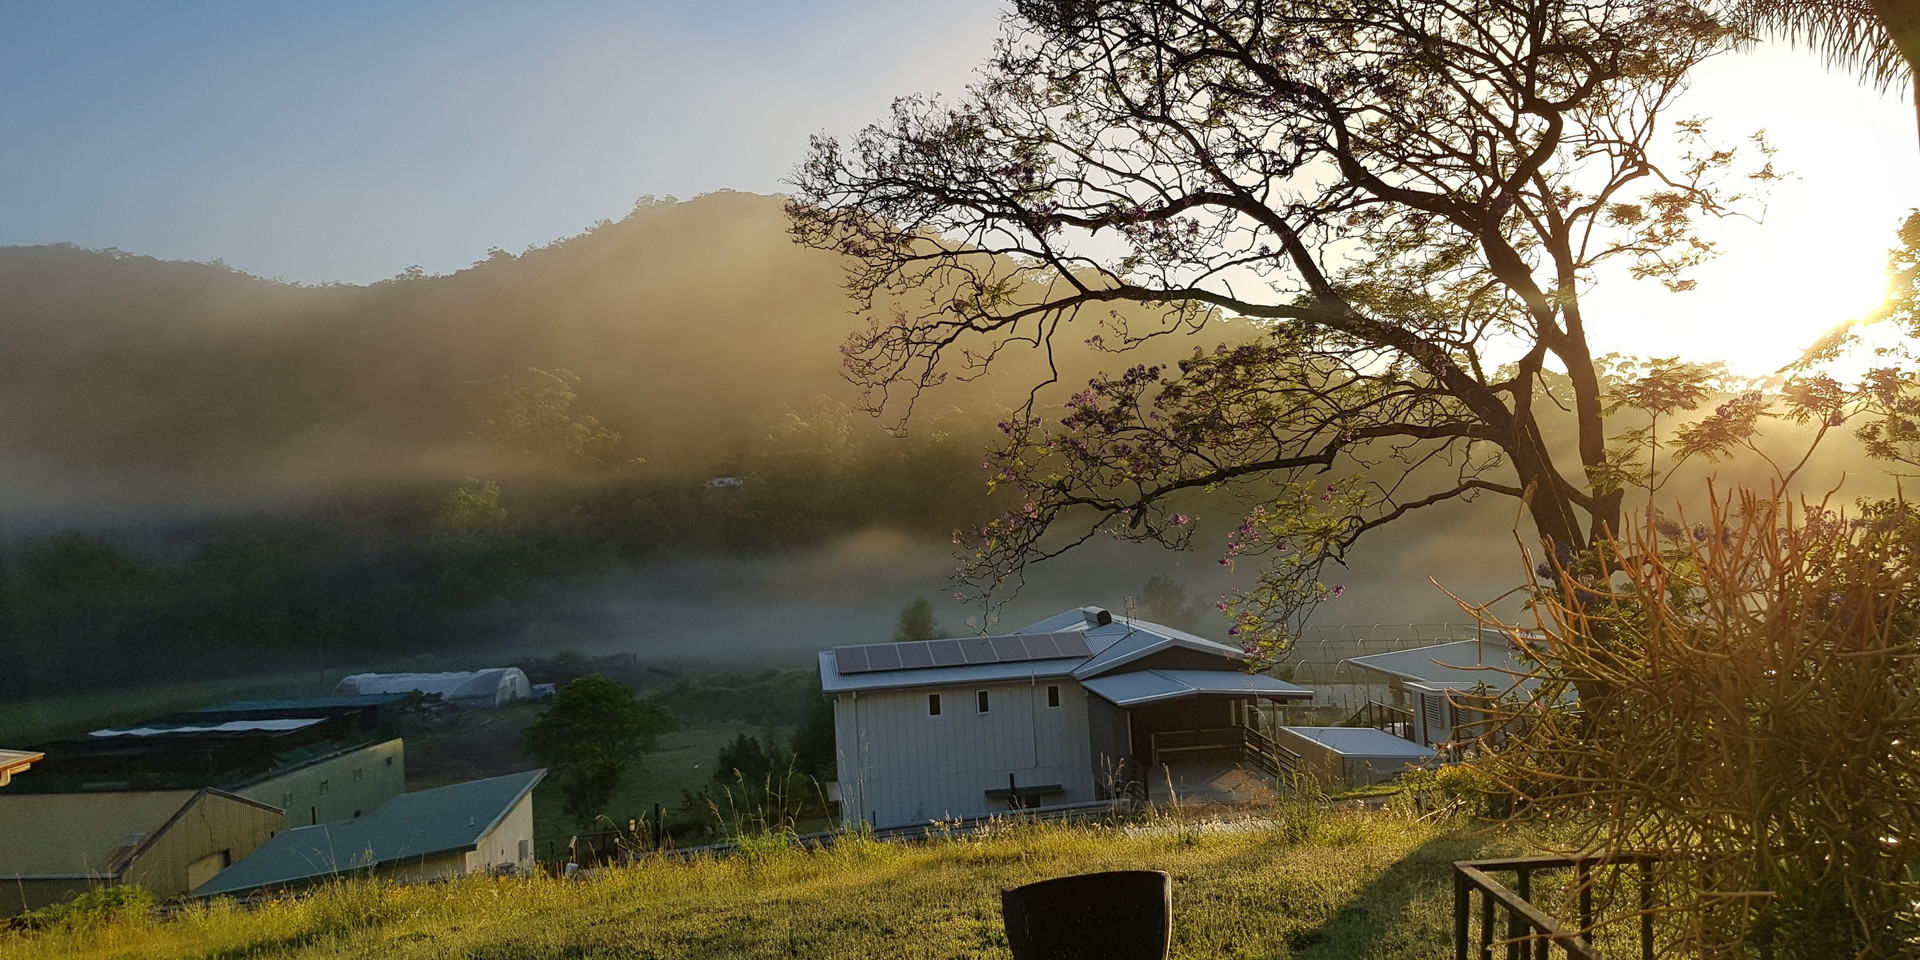 Morning mists from the verandah